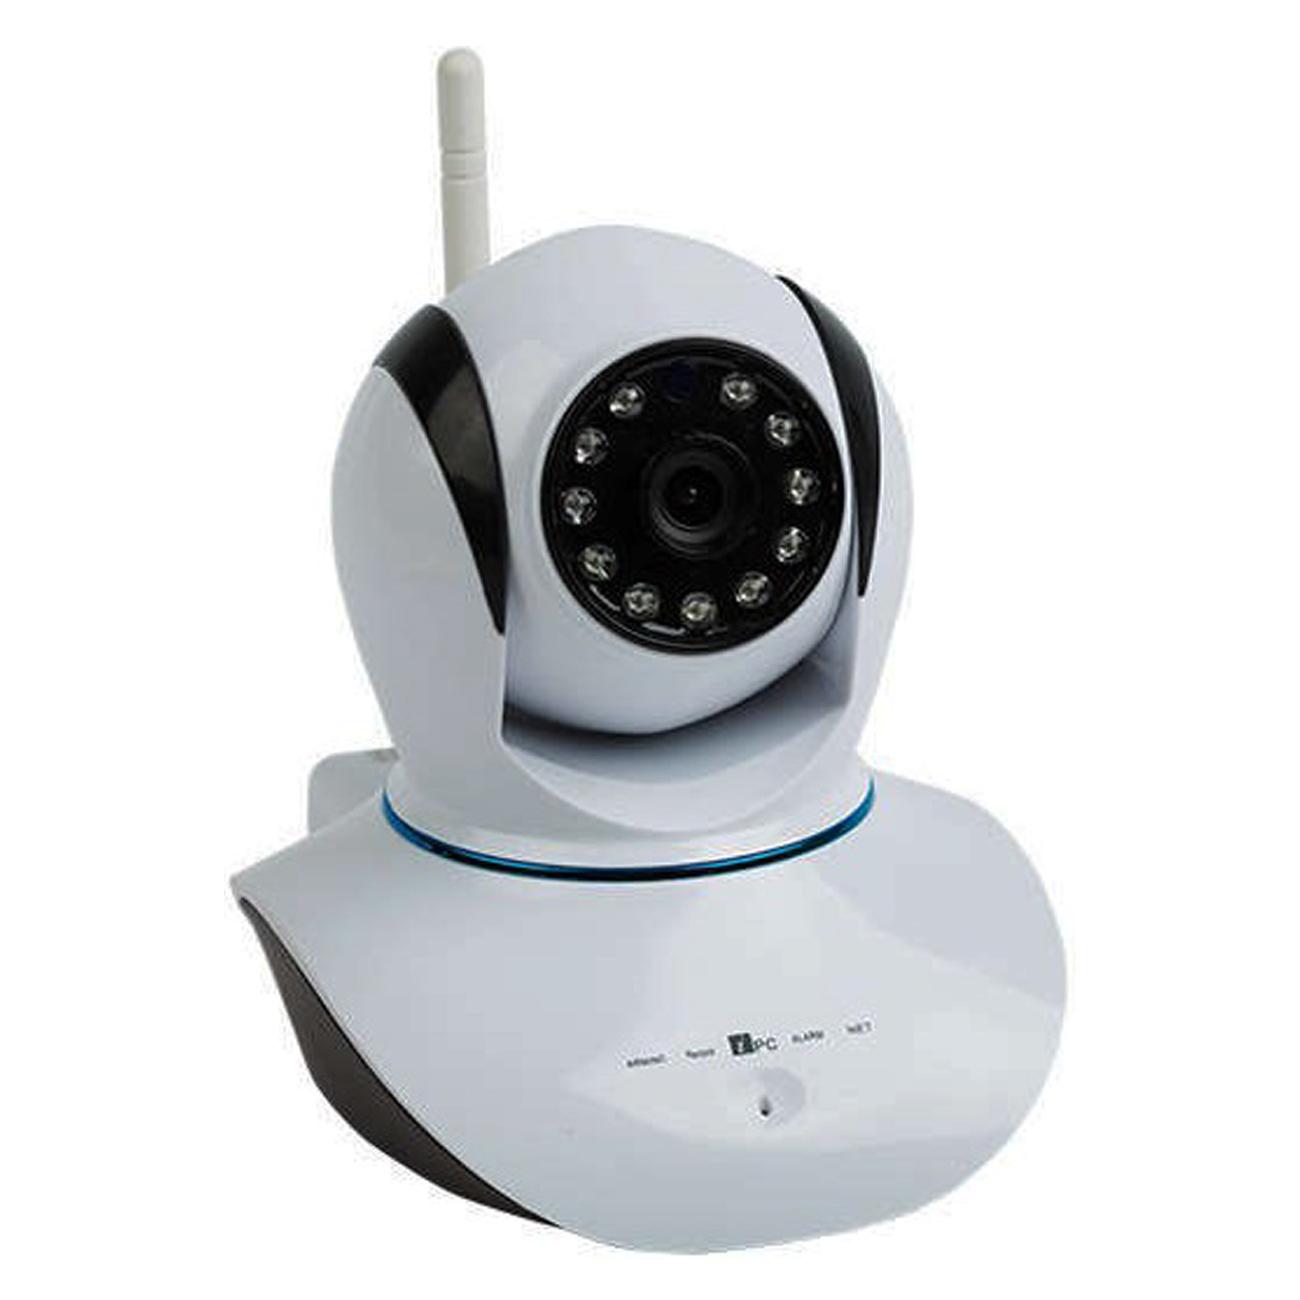 Фото Беспроводная поворотная камера WiFi Smart Rexant 1.0 Мп, (720P), ИК 10 м {45-0275}